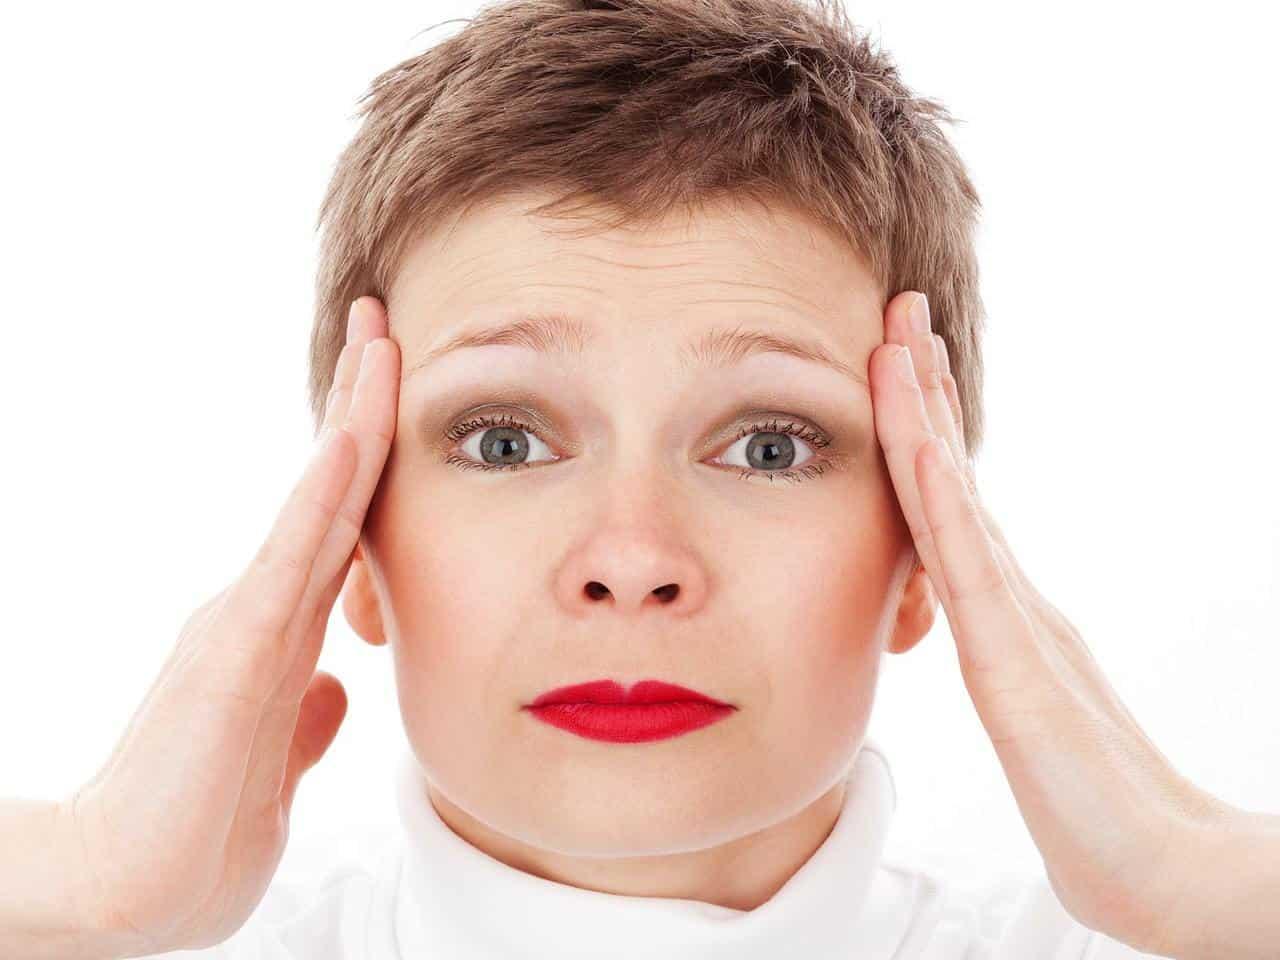 Diagnosticare un trauma cranico con un test portatile